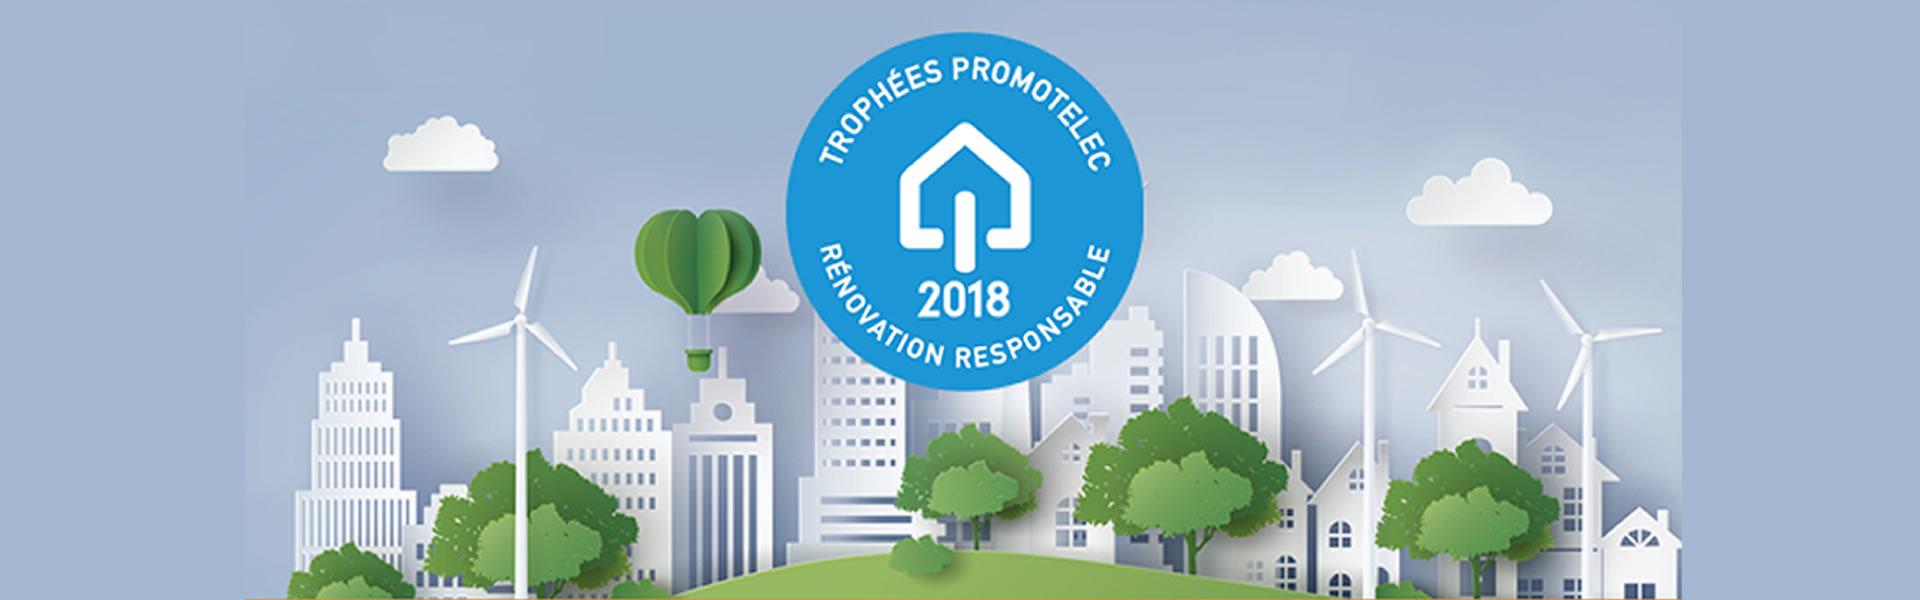 Trophees-Promotelec-2018